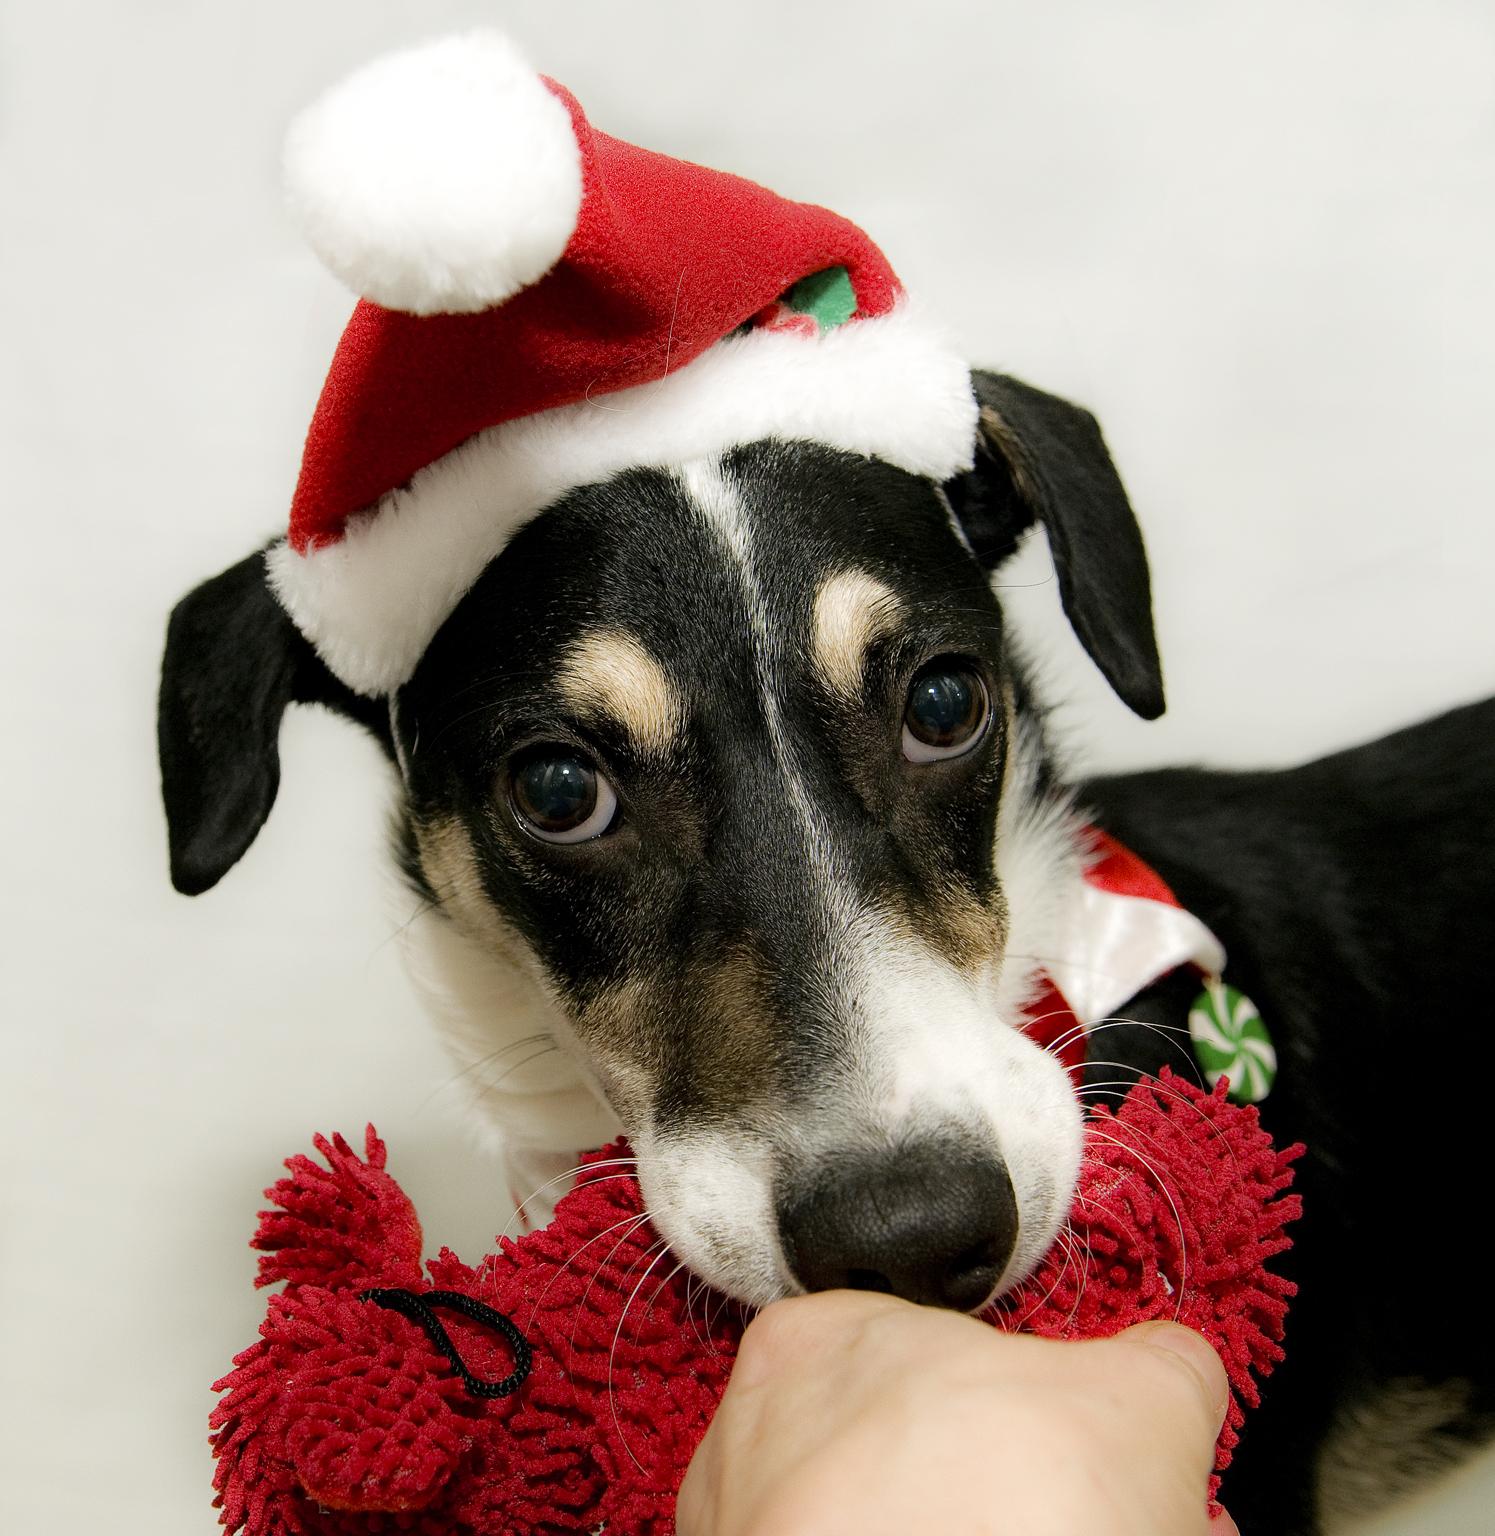 Dr. Pawz: 5 pet hazards to avoid this holiday season